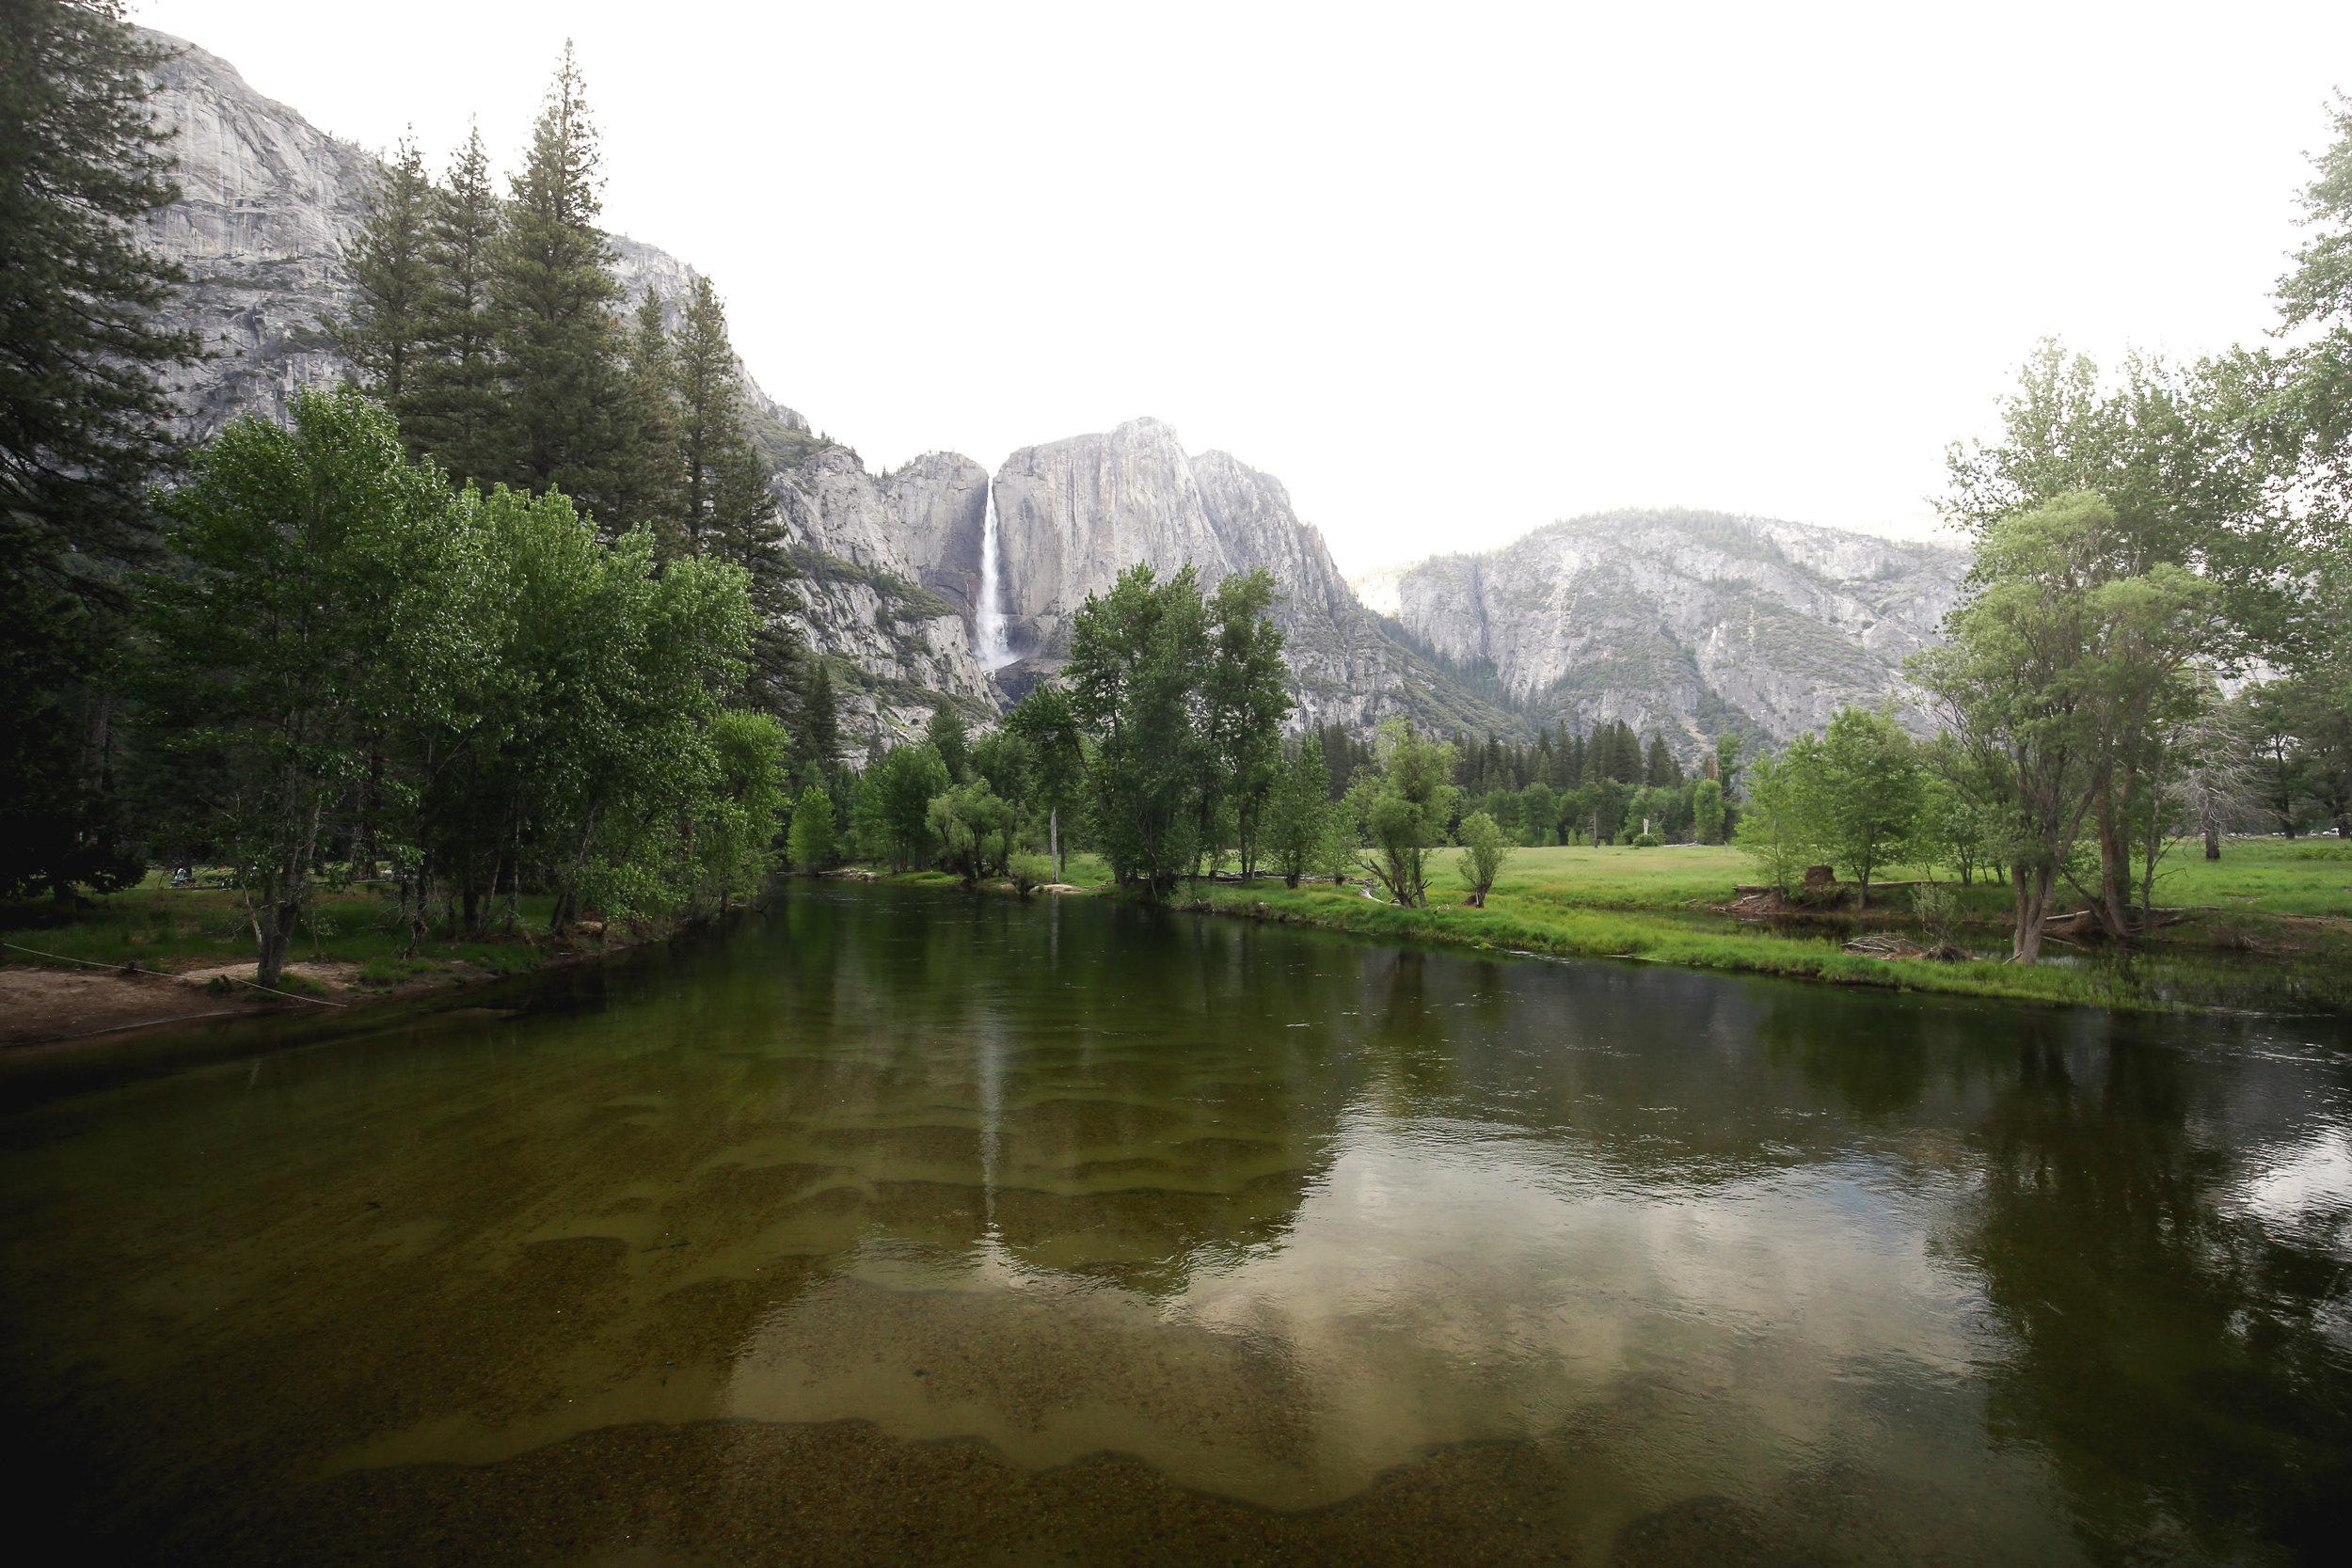 yosemite-river-waterfall-background